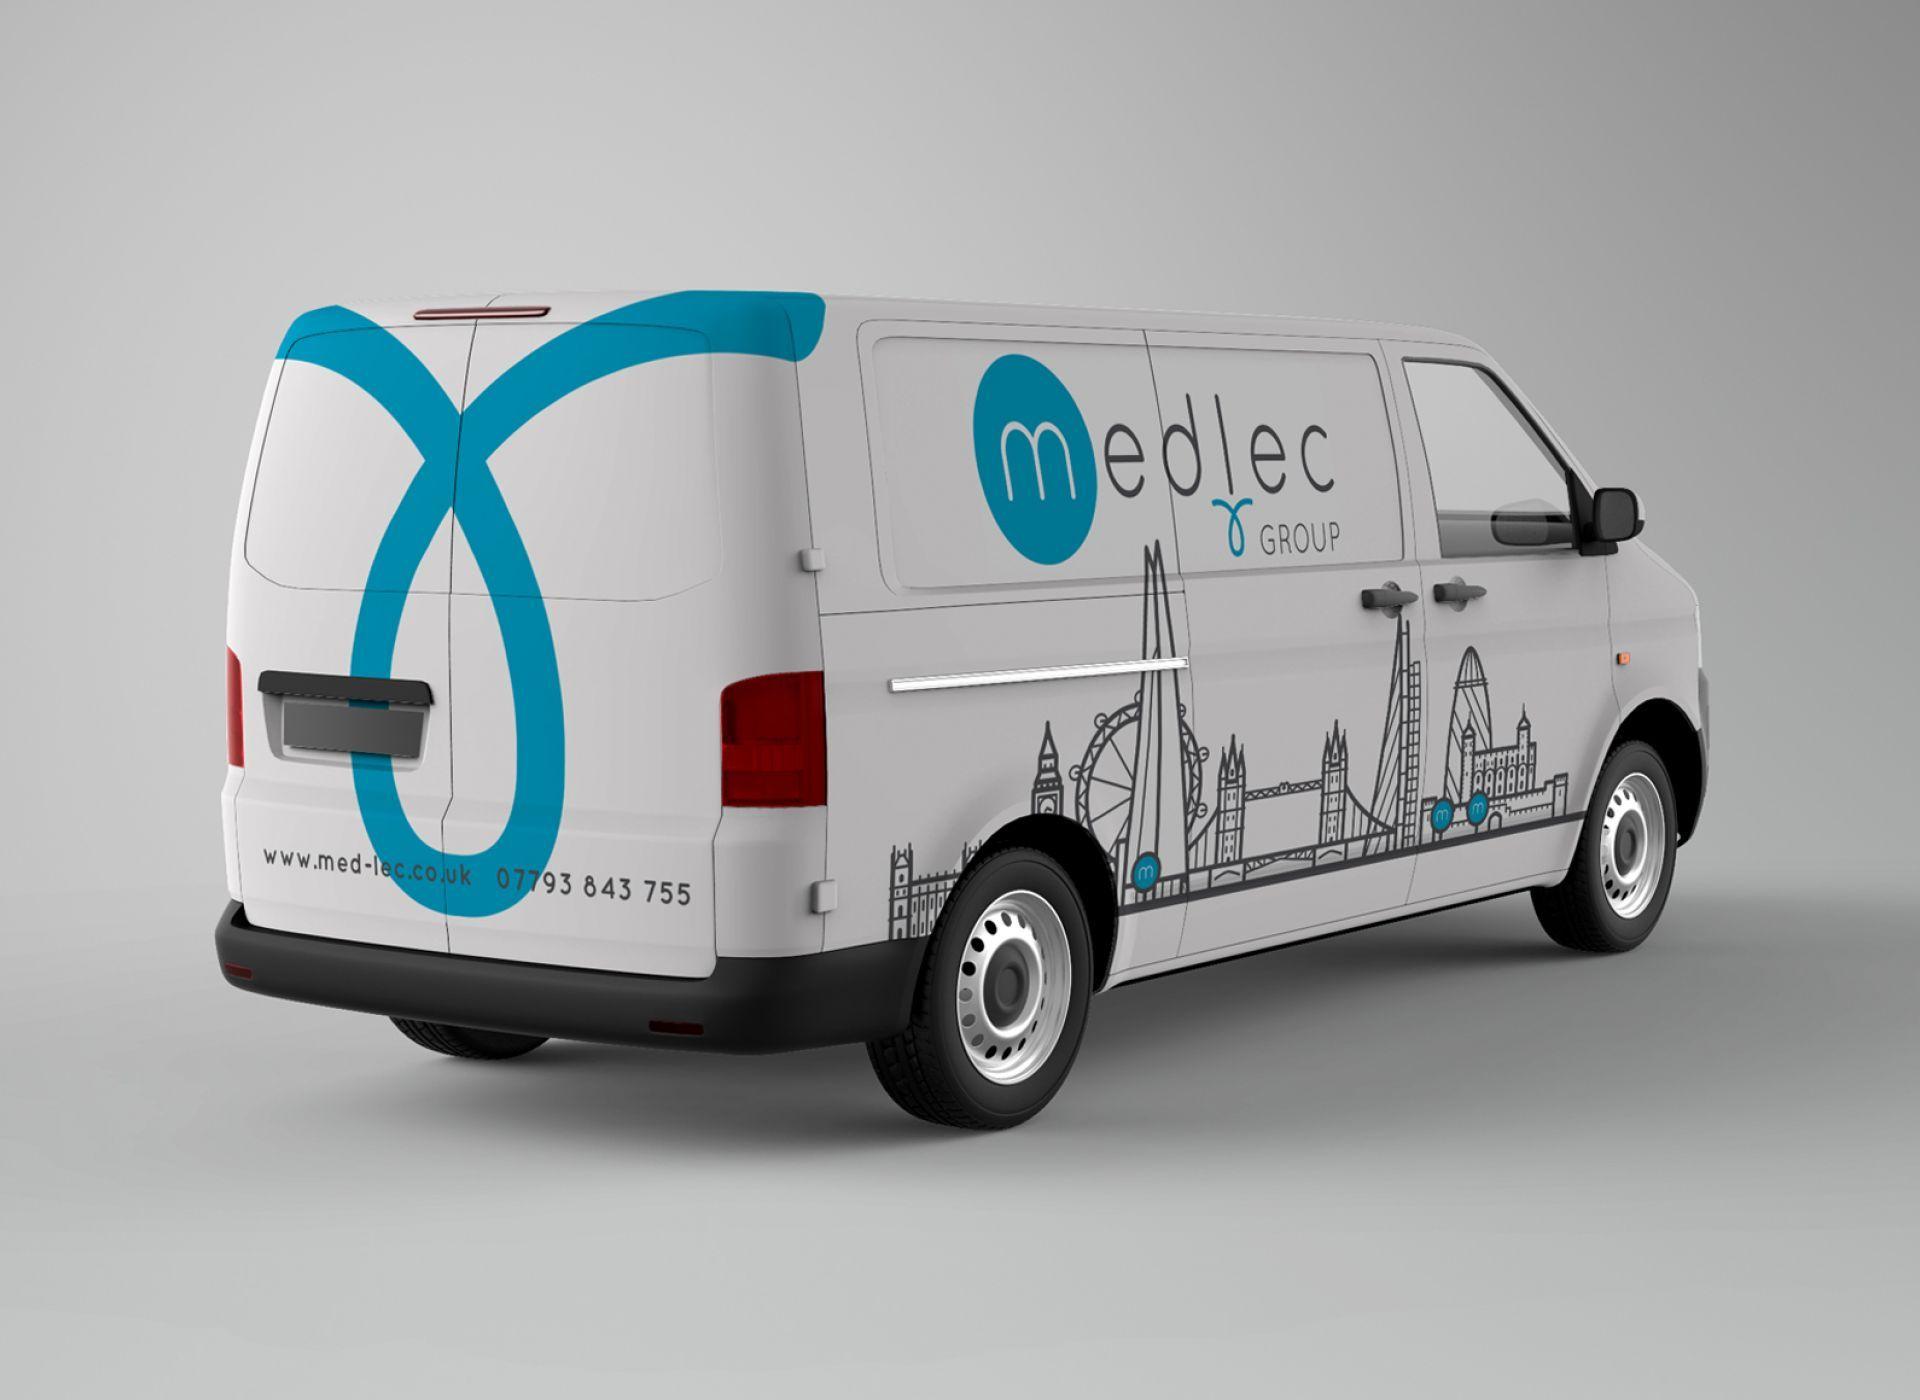 Van Signage For The New Medlec Branding Van Signage Branding